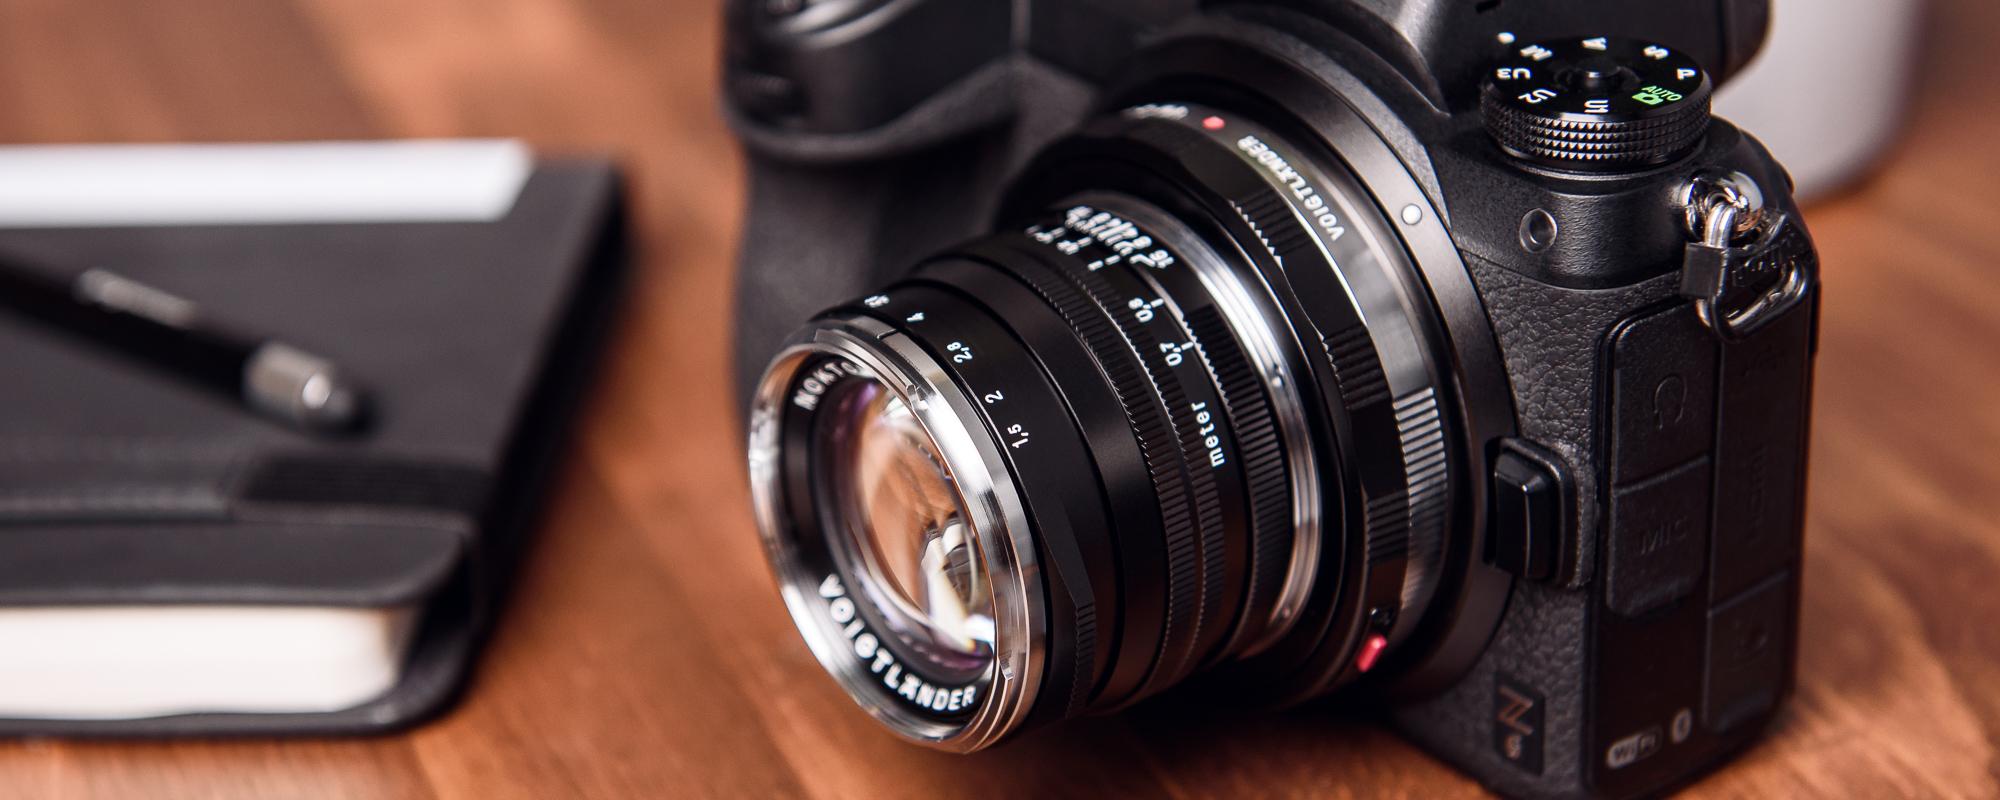 Obiektyw Voigtlander Nokton II 50 mm f/1,5 do Leica M - MC, czarny na aparacie